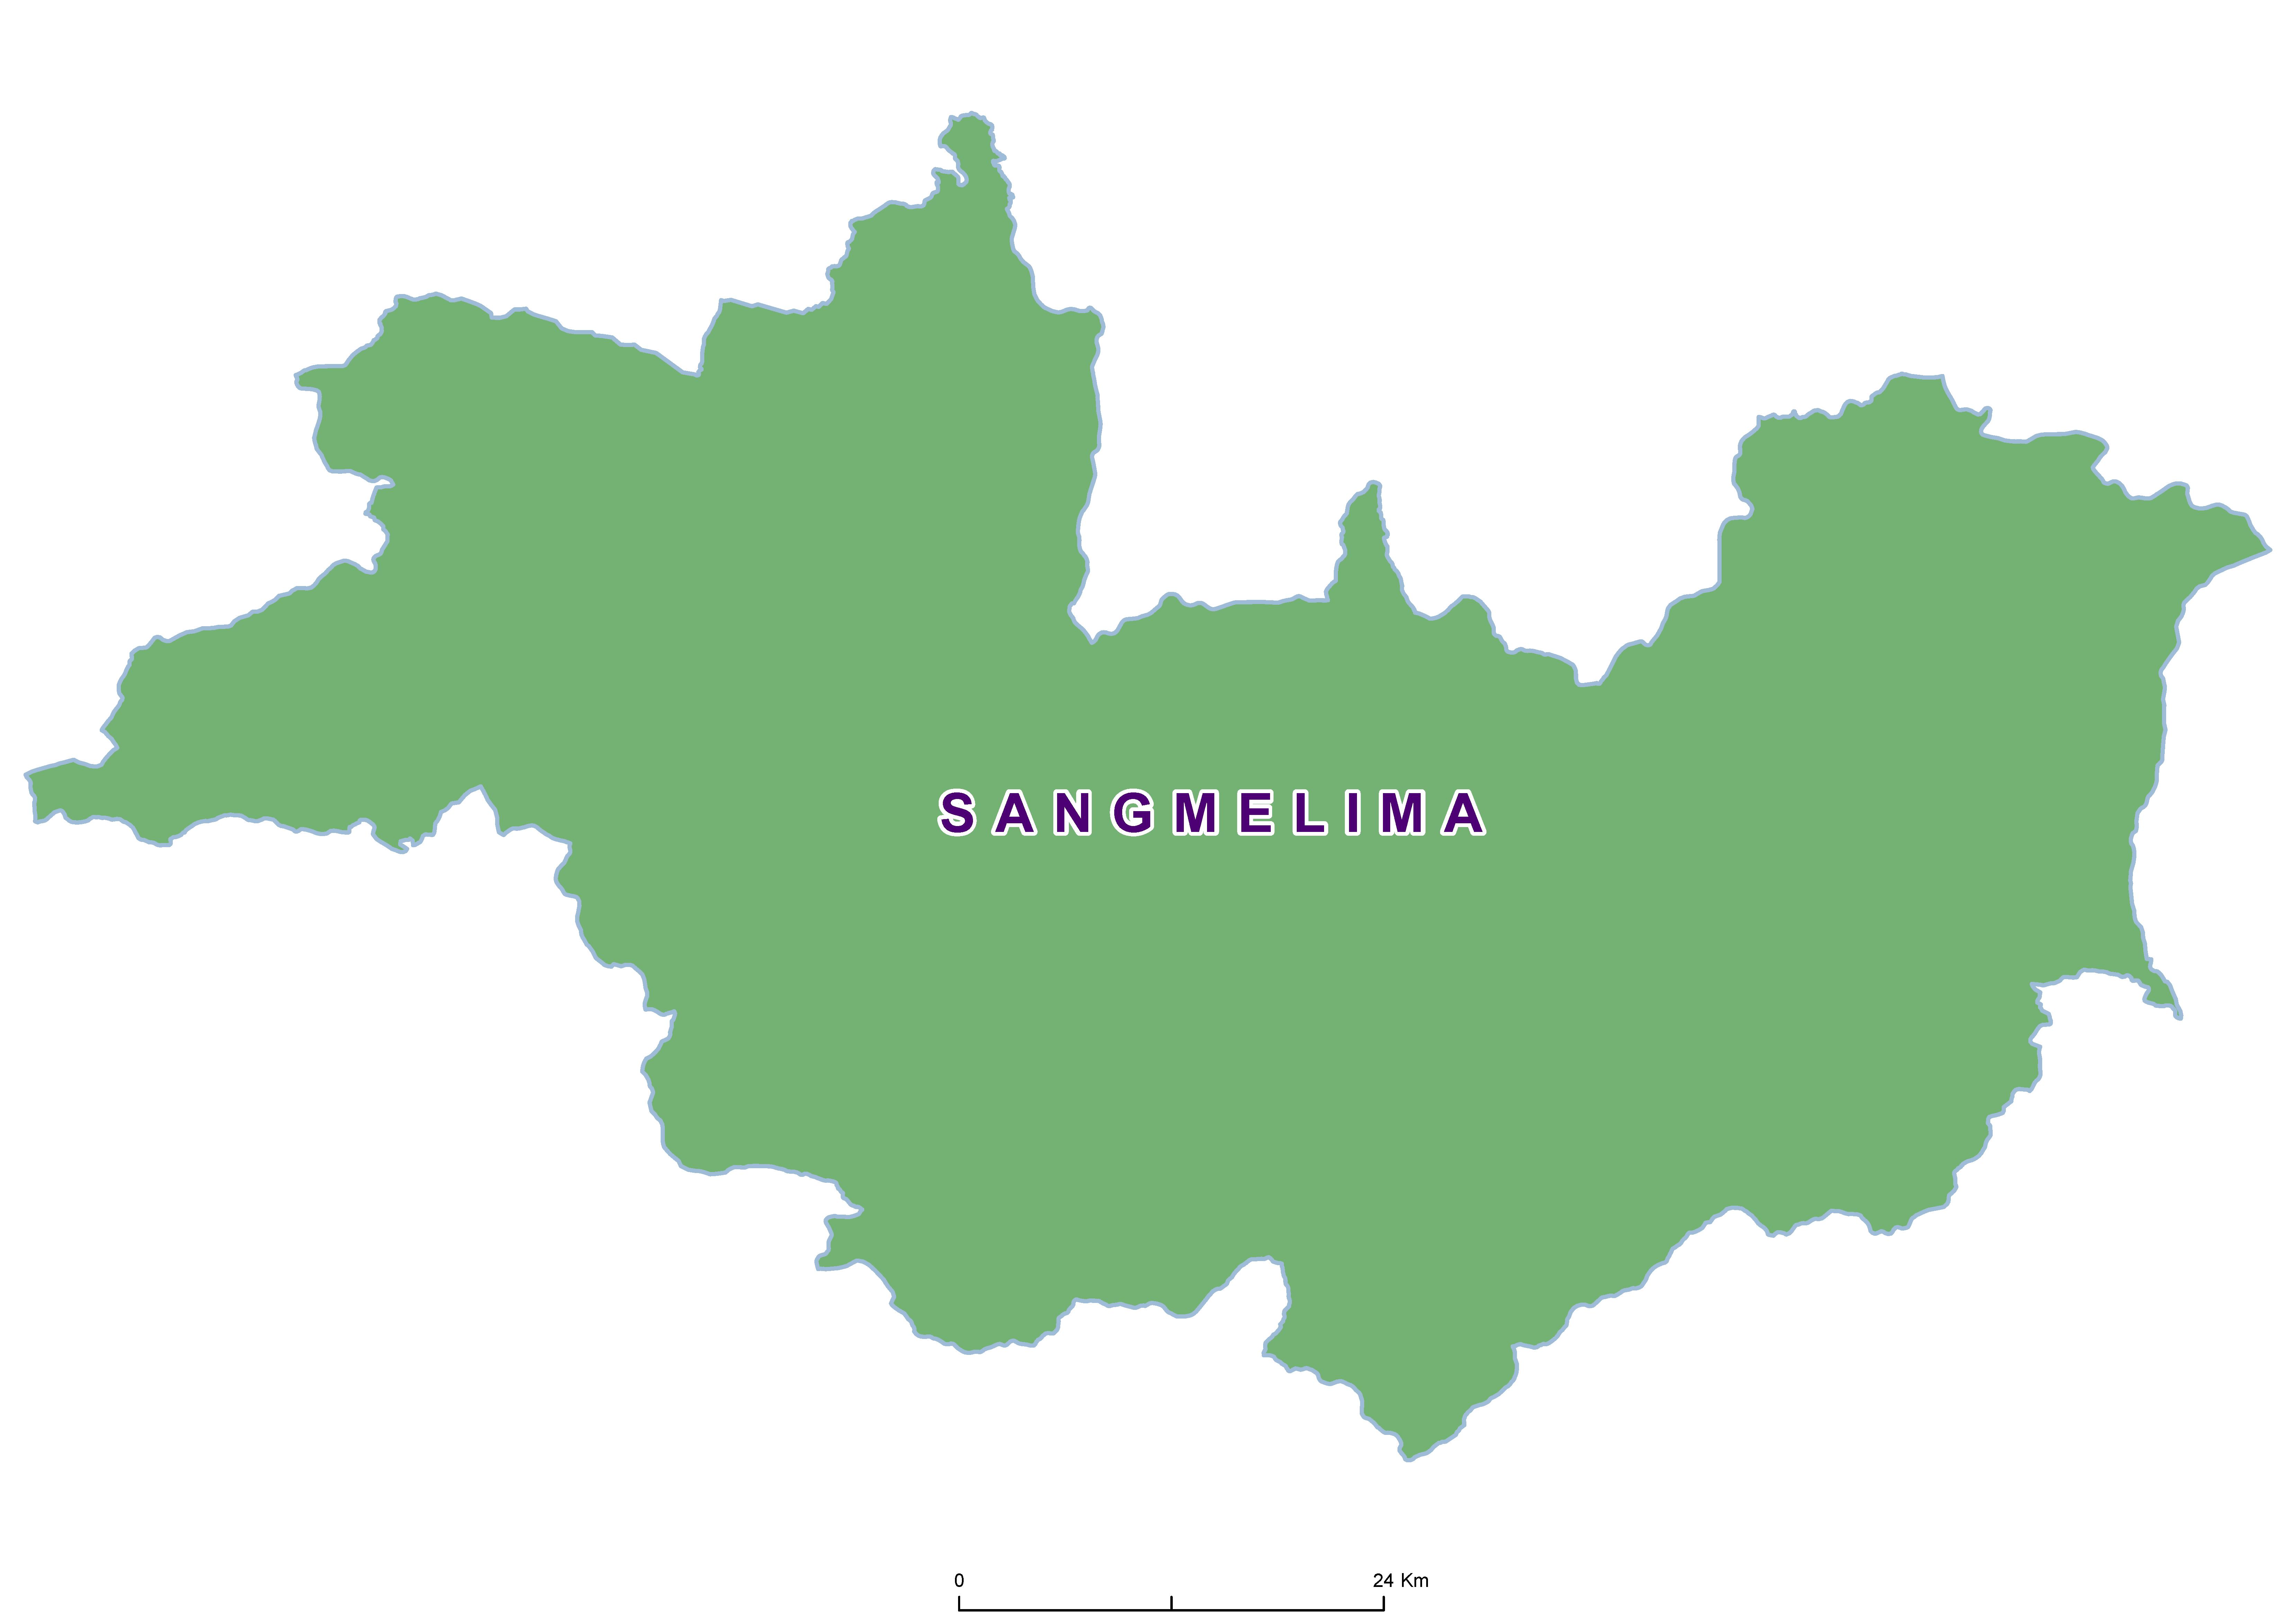 Sangmelima Mean SCH 19850001